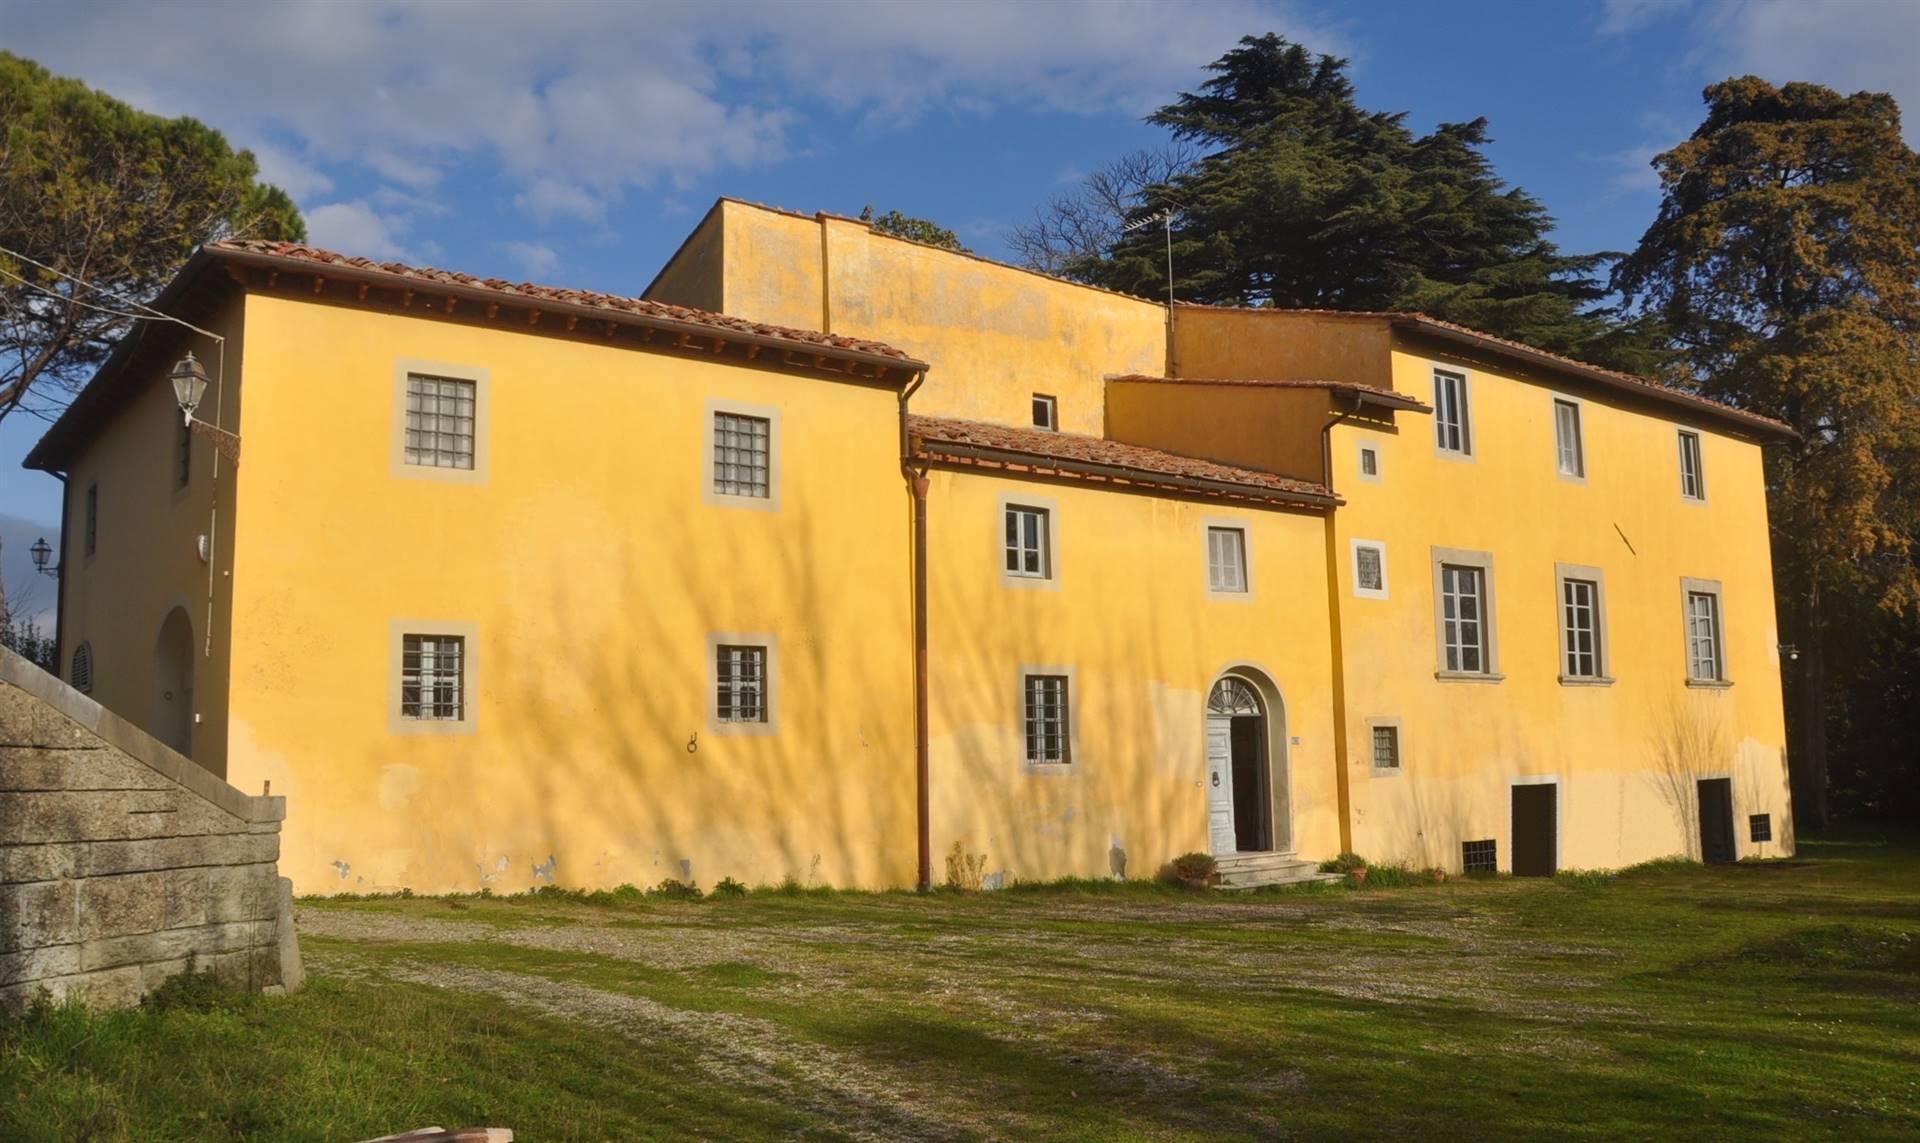 Rustico in vendita a Crespina Lorenzana (PI)